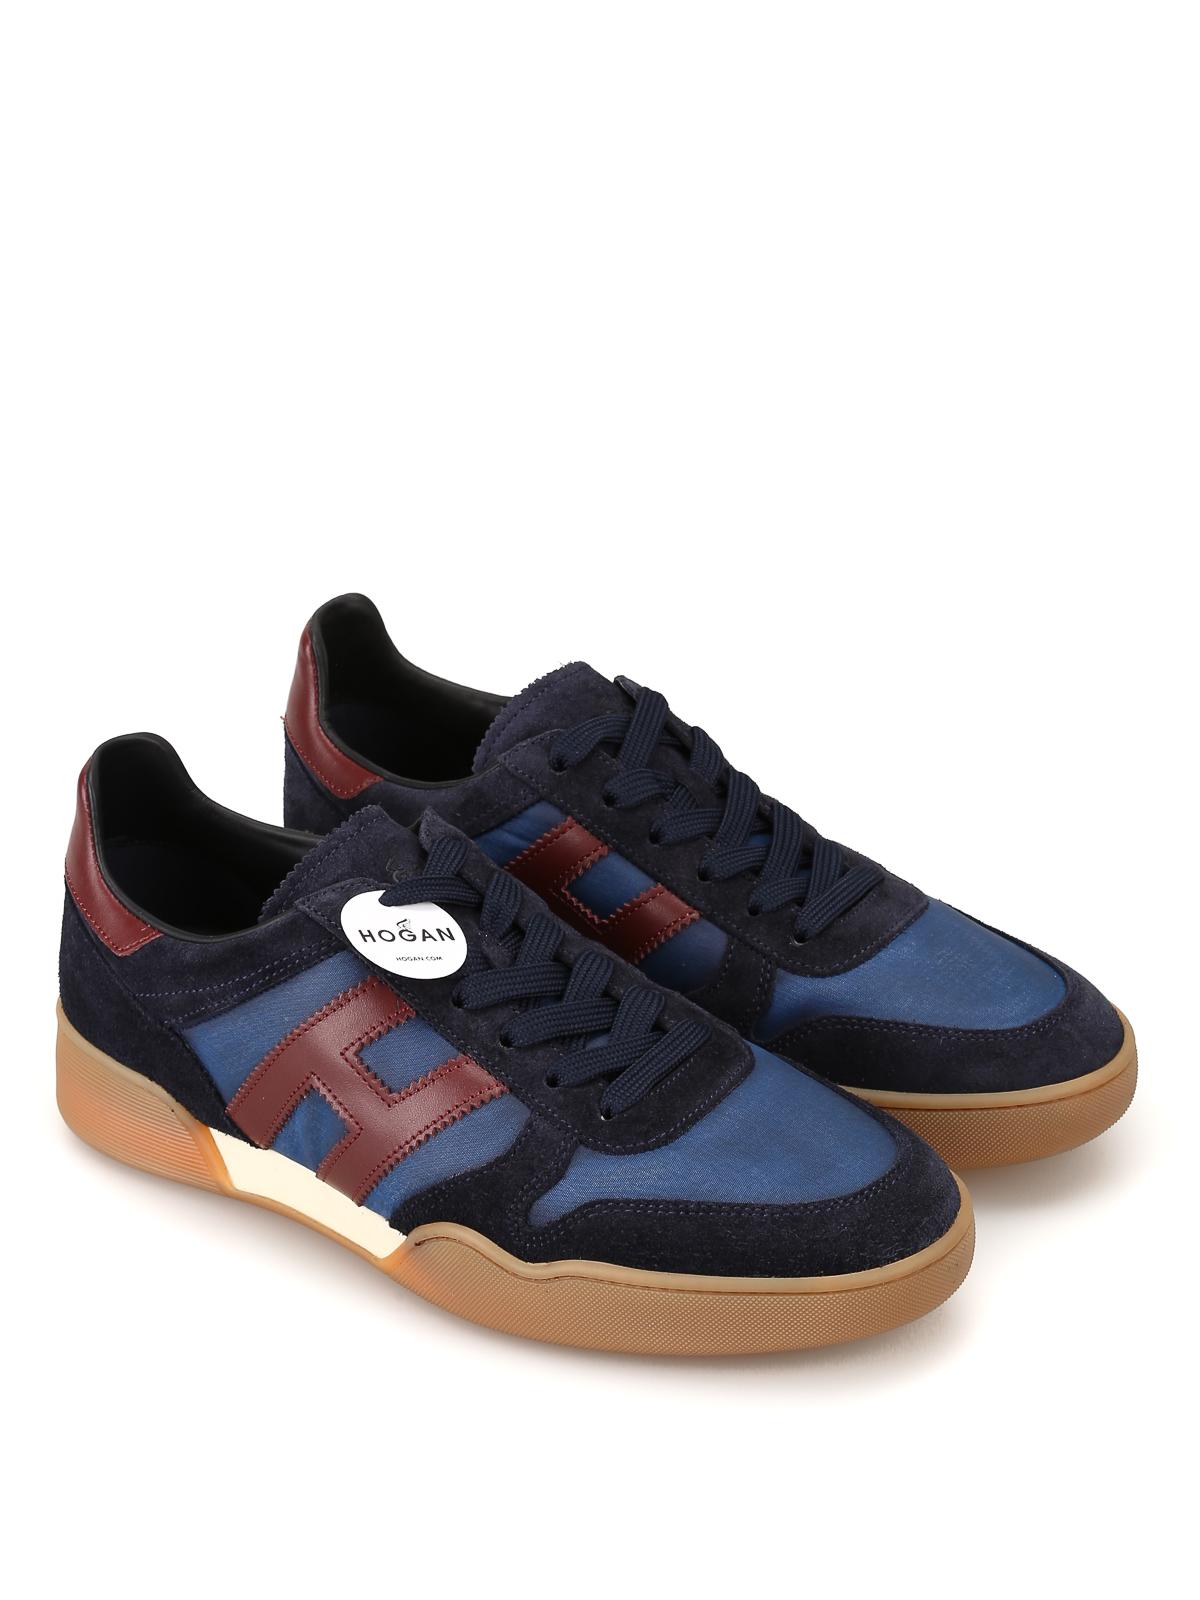 Trainers Hogan - H357 blue sporty sneakers - HXM3570AC41JCM894F